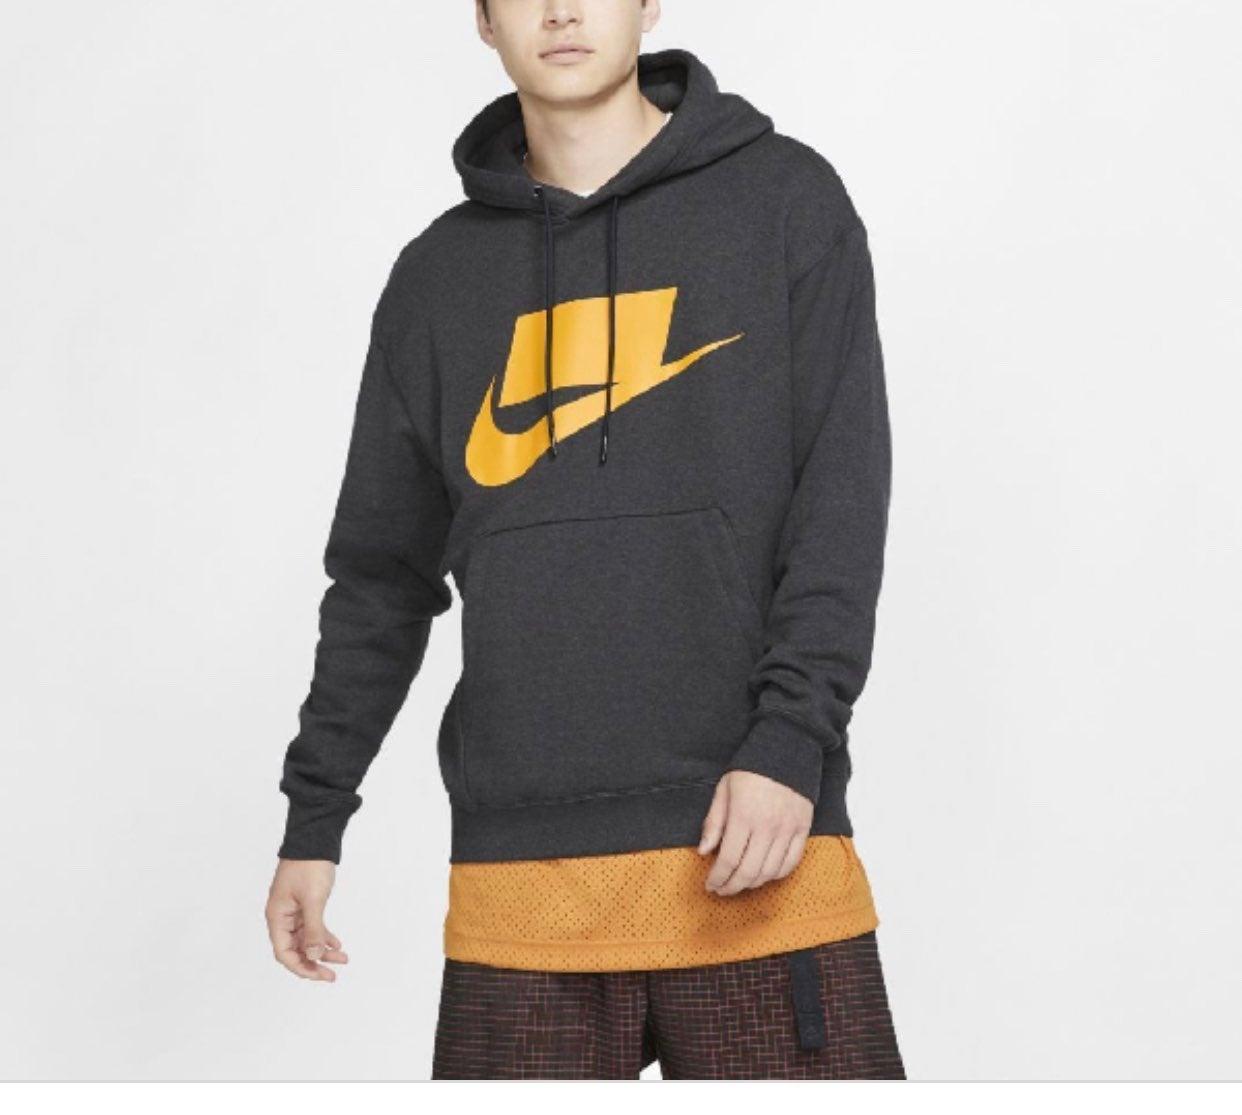 Nike innovation hood XL